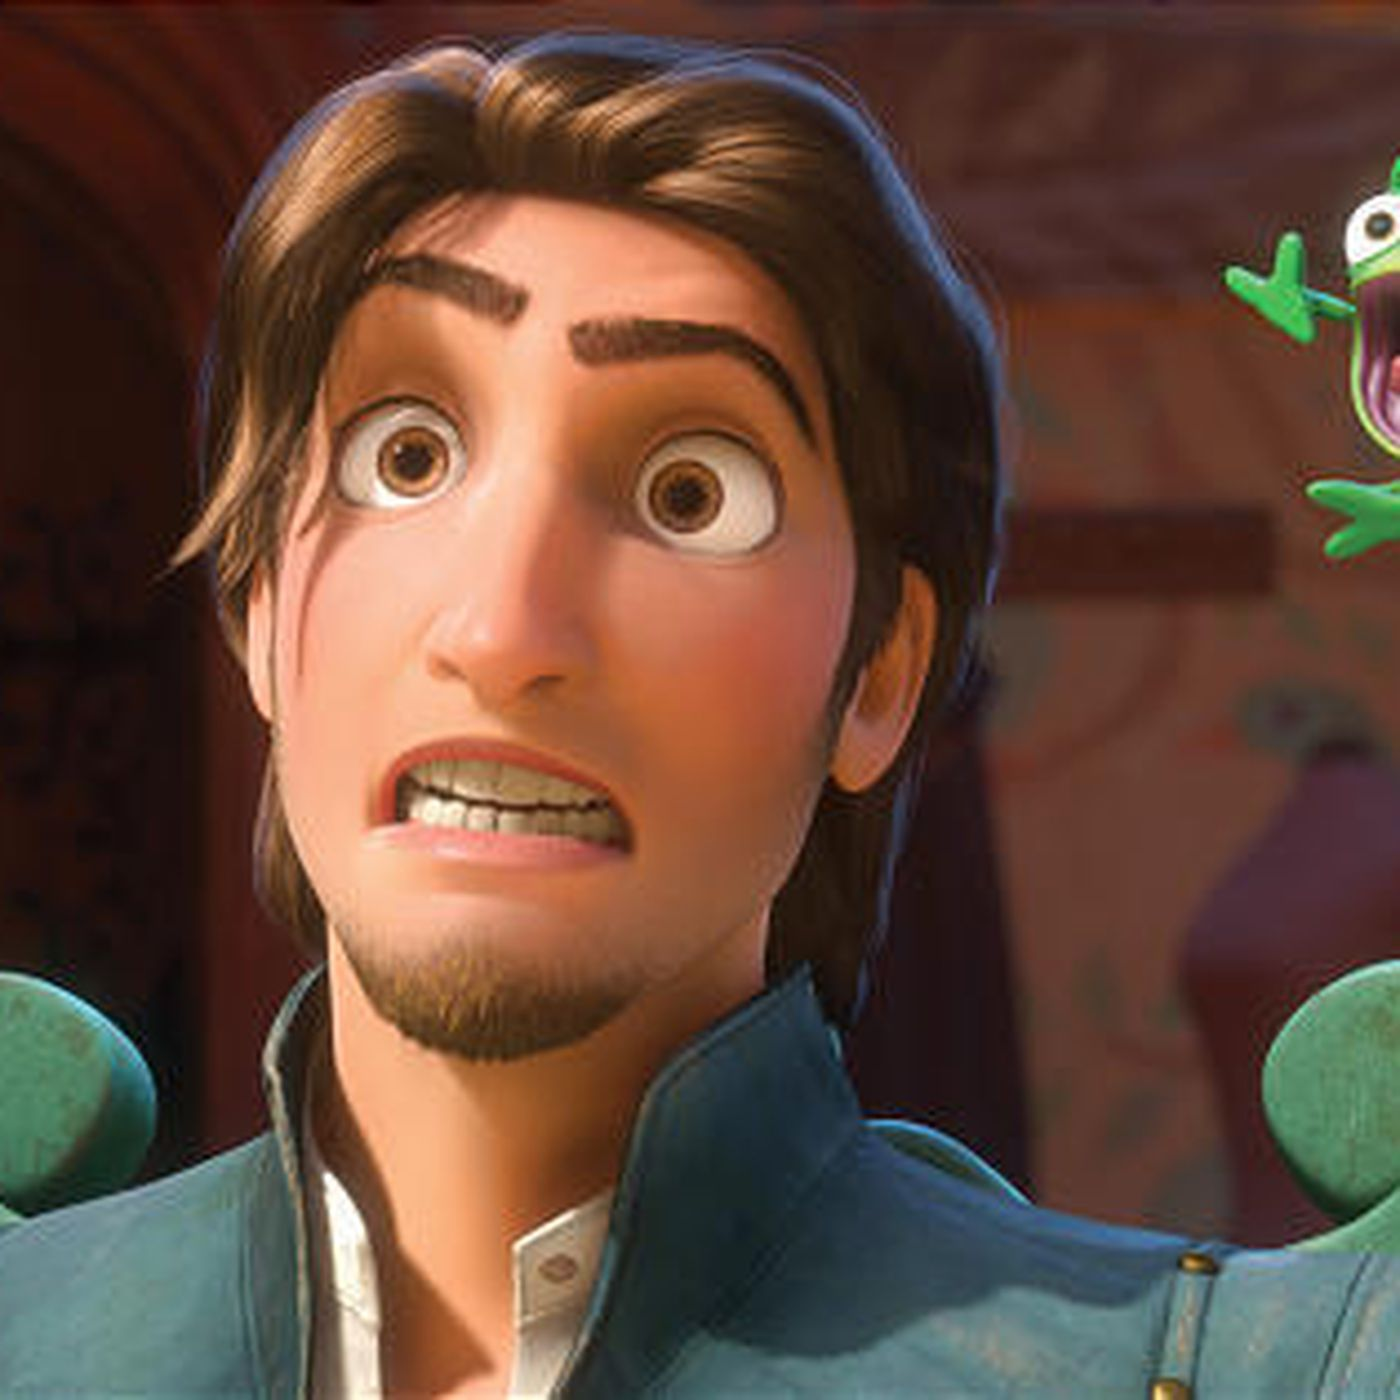 Coronavirus Theory Did Disney S Tangled Predict Covid 19 Deseret News